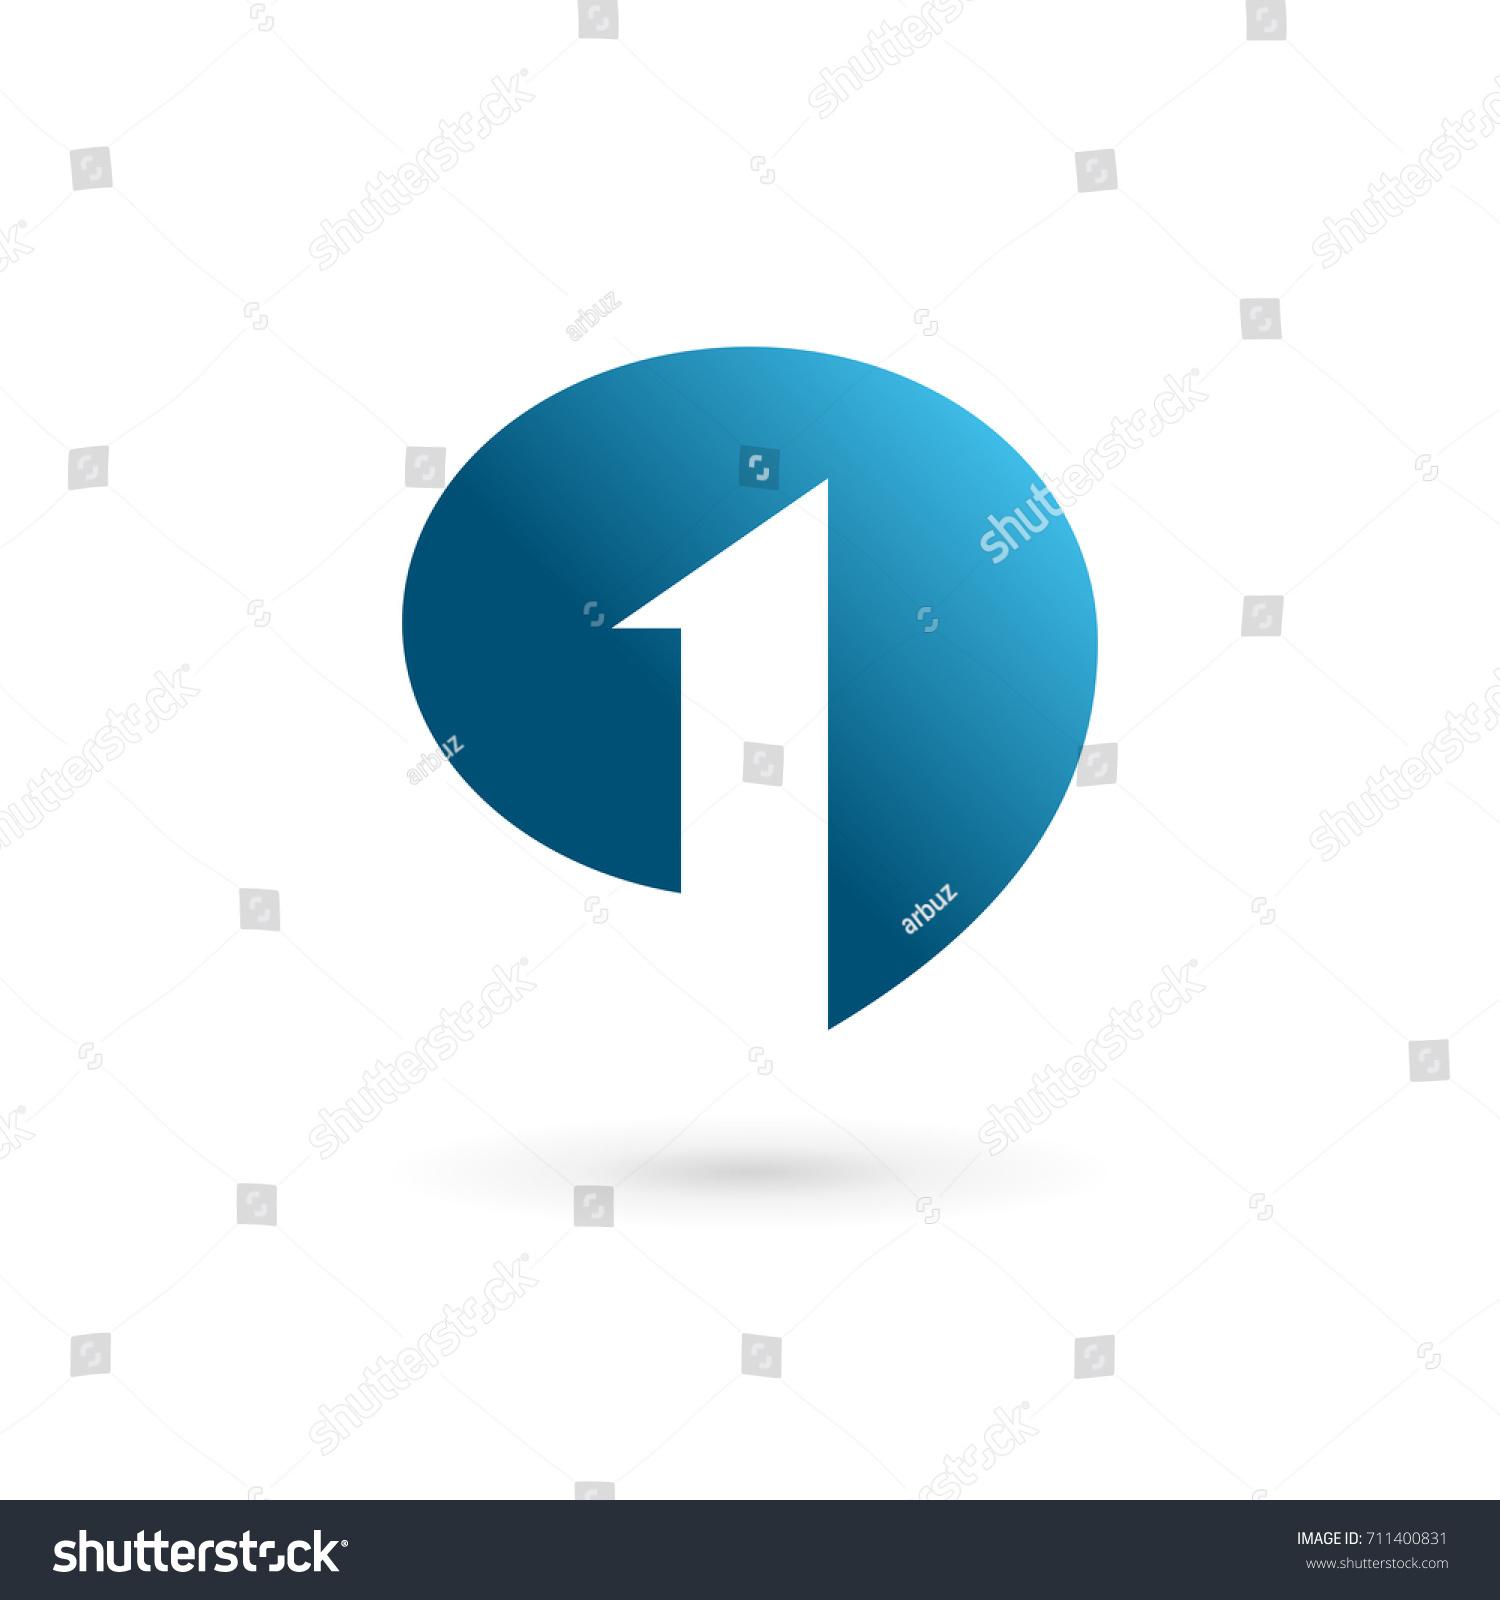 number 1 speech bubble logo iconのイラスト素材 711400831 shutterstock